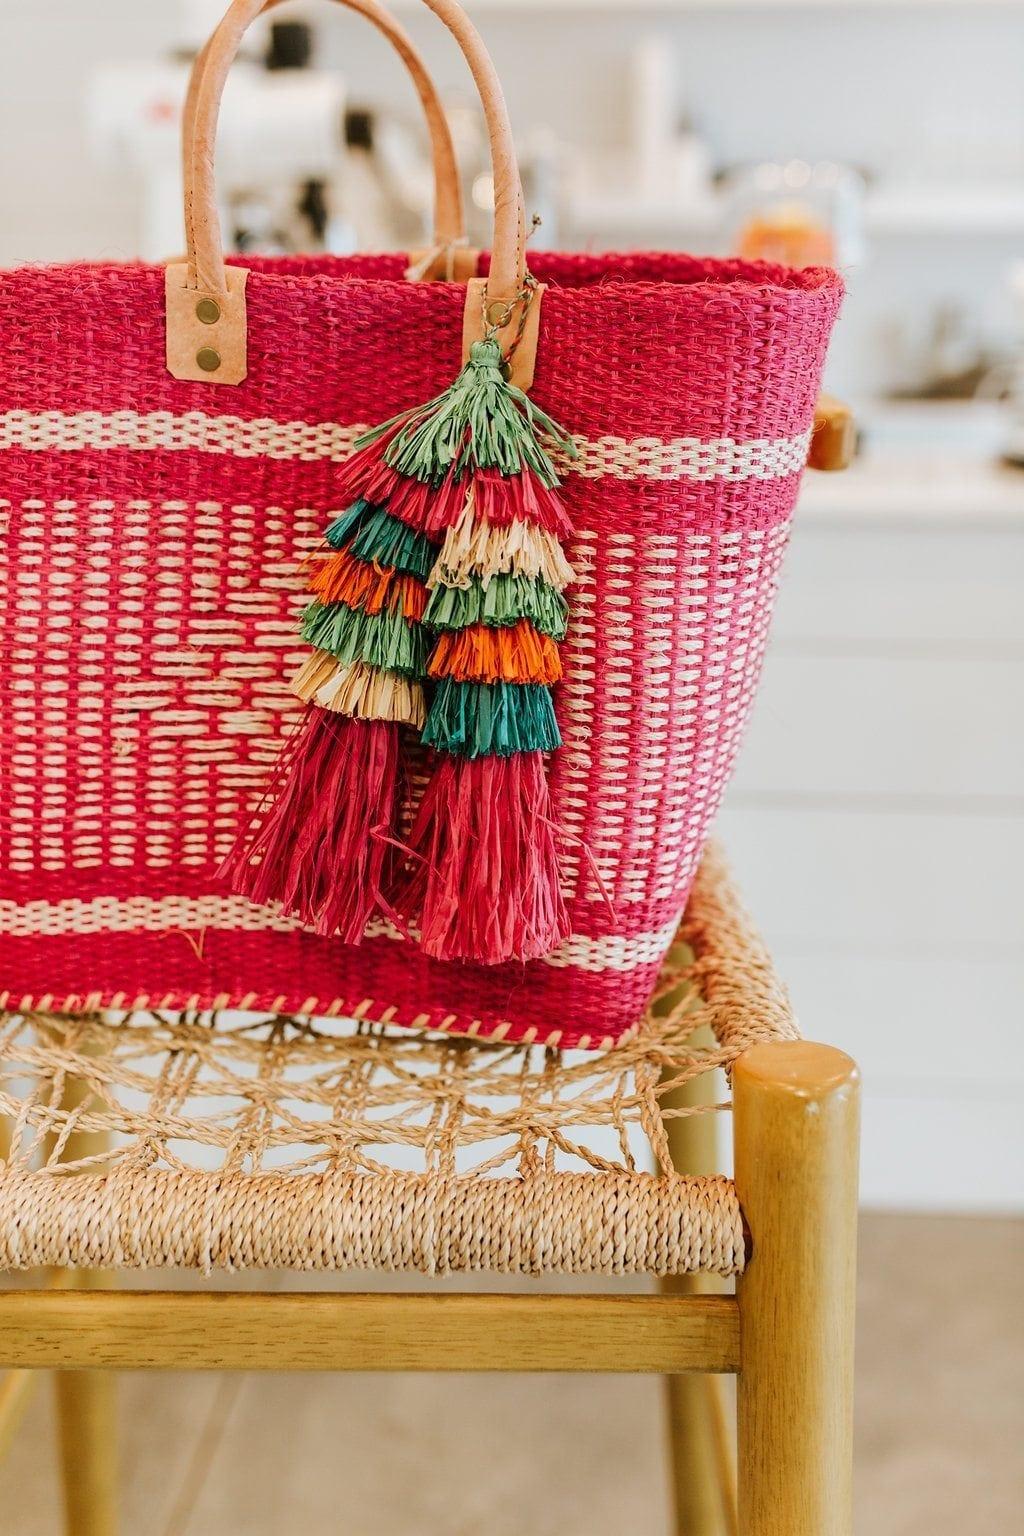 pink straw tote bag